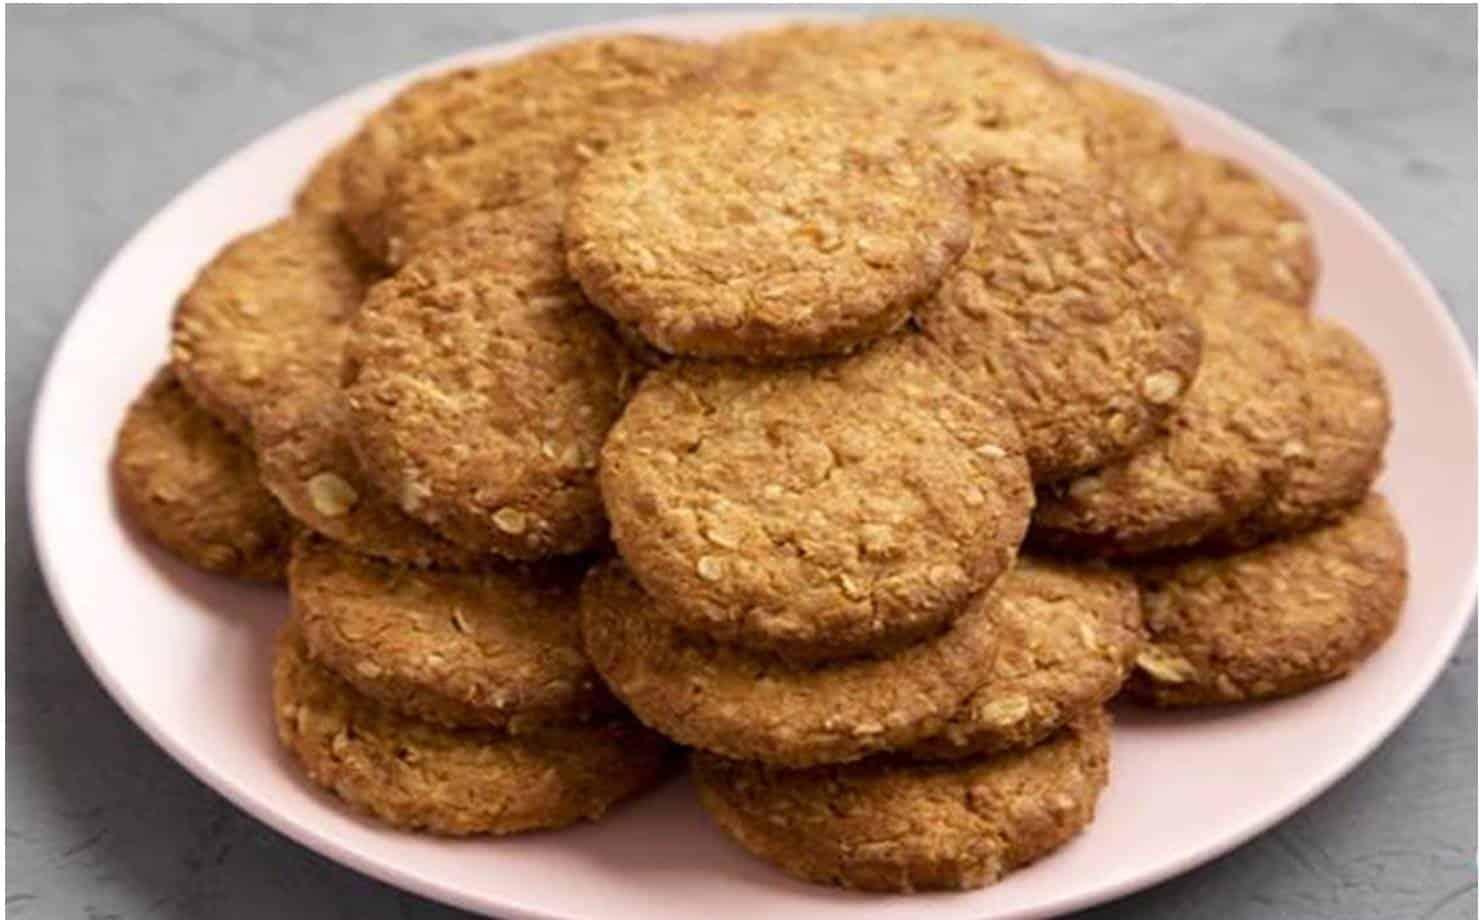 Receita de biscoitos de aveia fáceis e rápidos